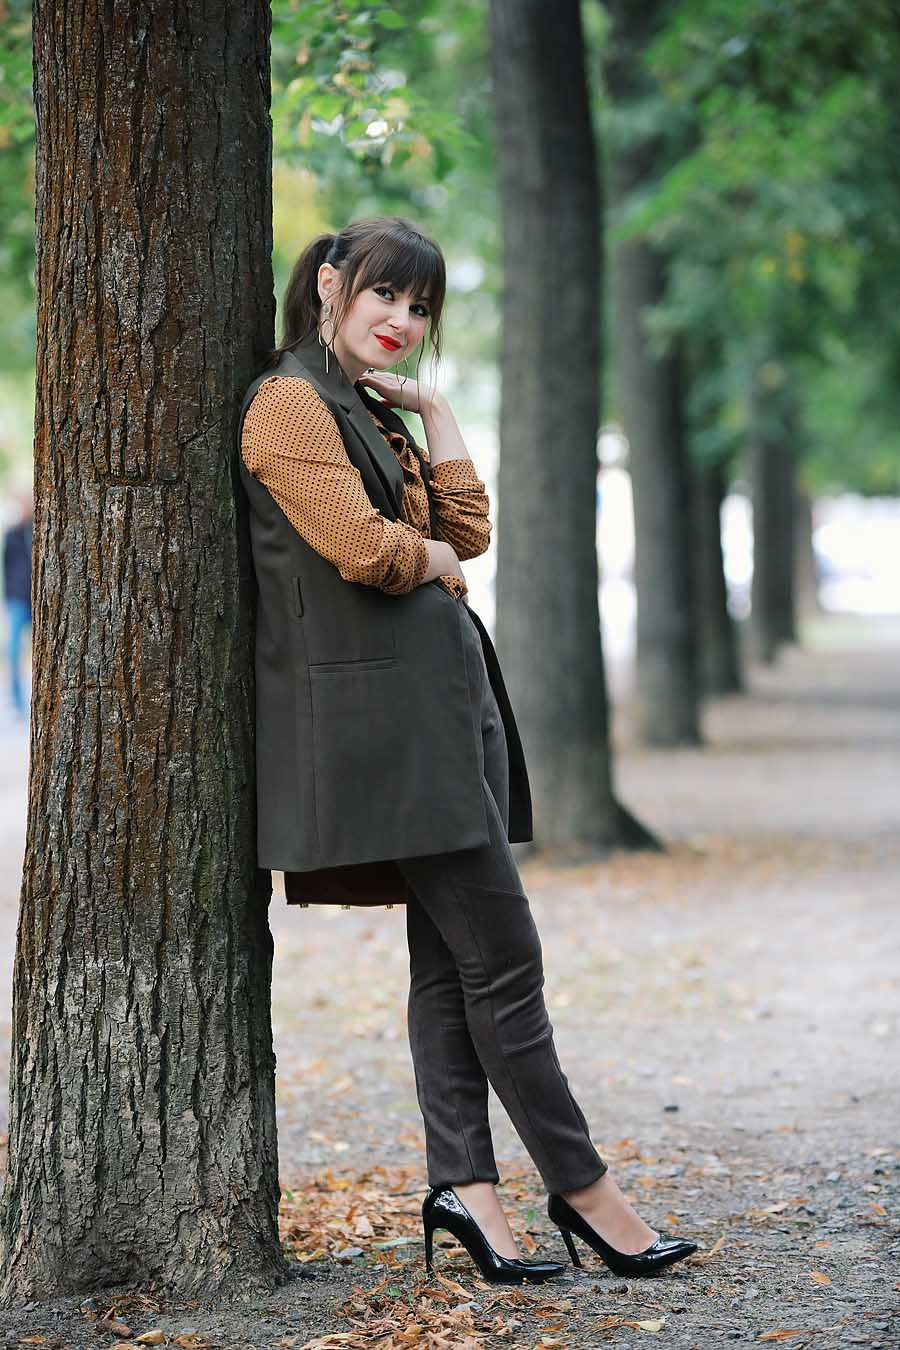 Büro-Outfit-Inspiration-für-Herbst